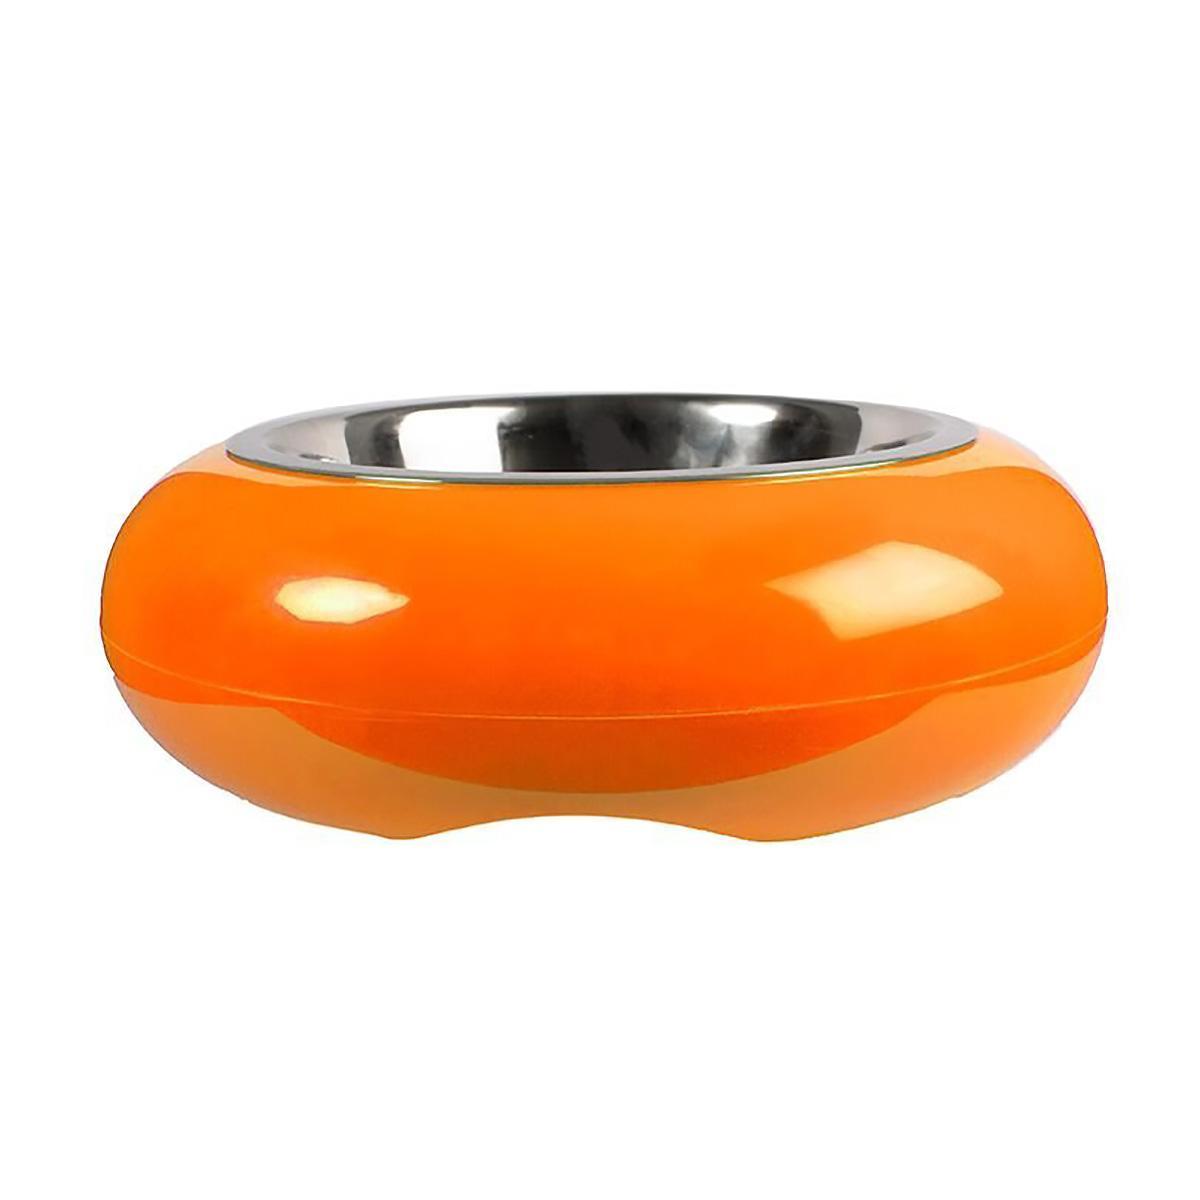 The Pod Bowl Non-Slip Dog Bowl by Hing - Orange